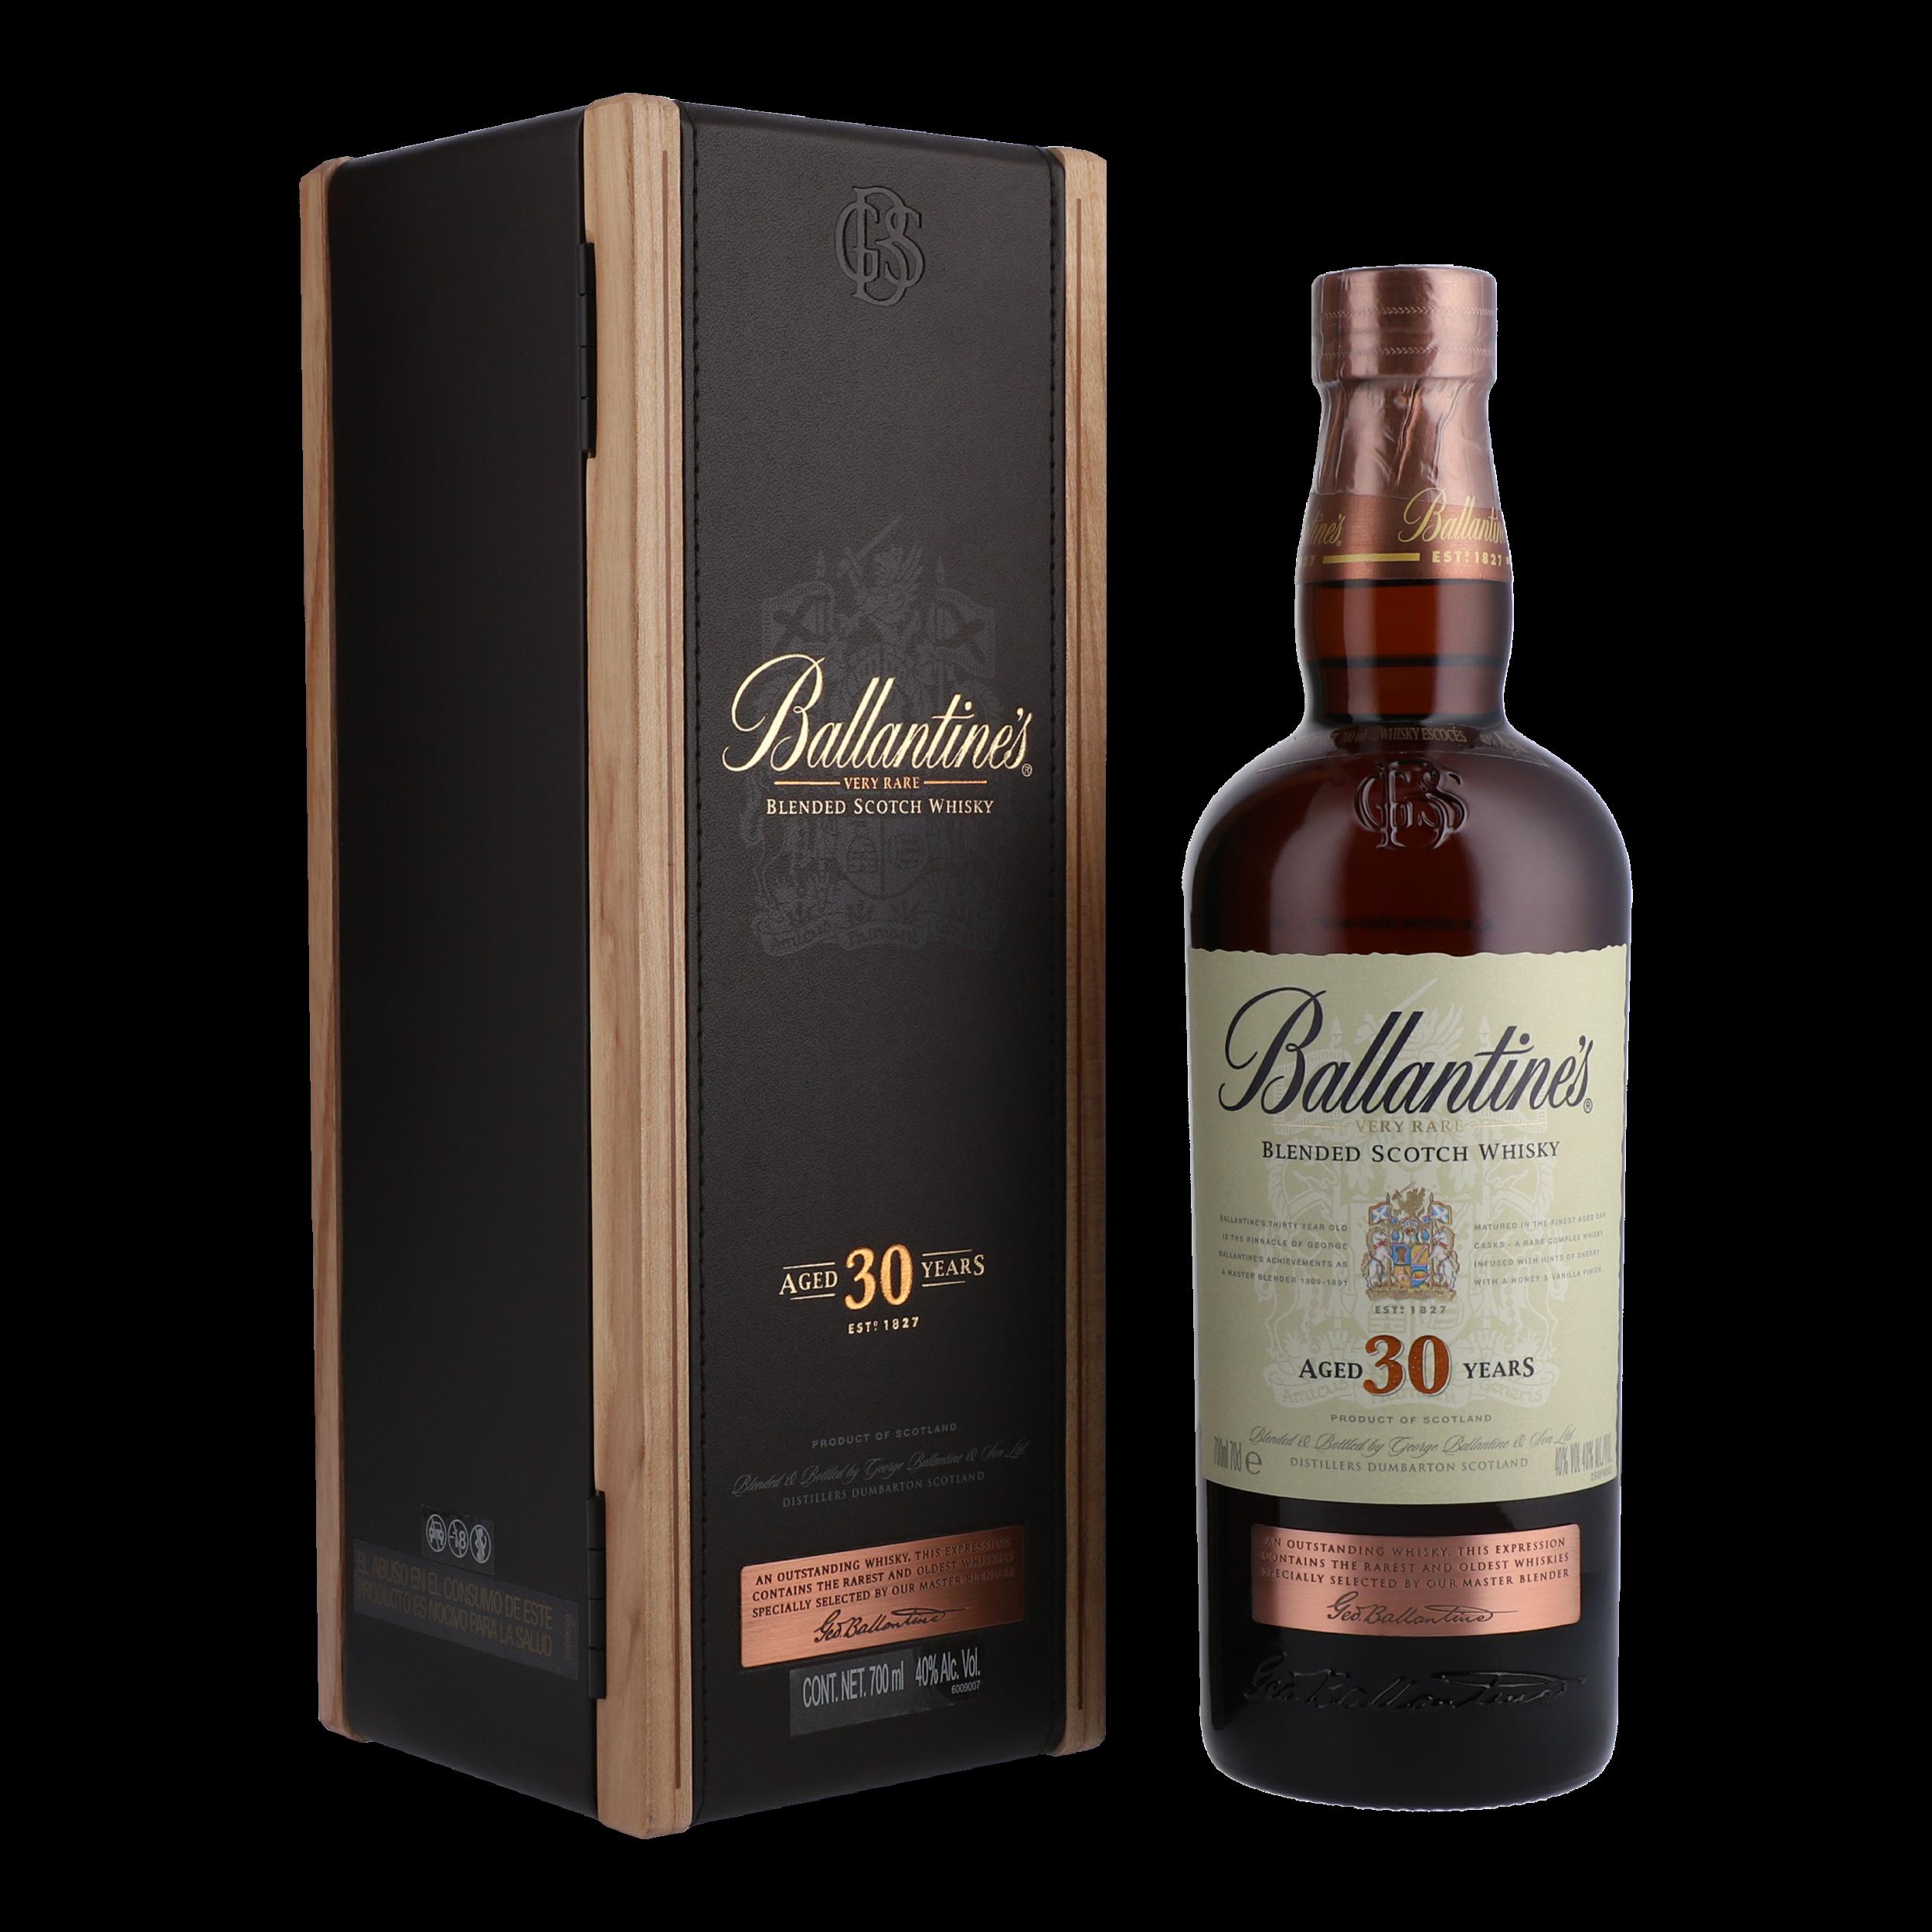 Ballantine's 30 Years Oldduty-free whisky